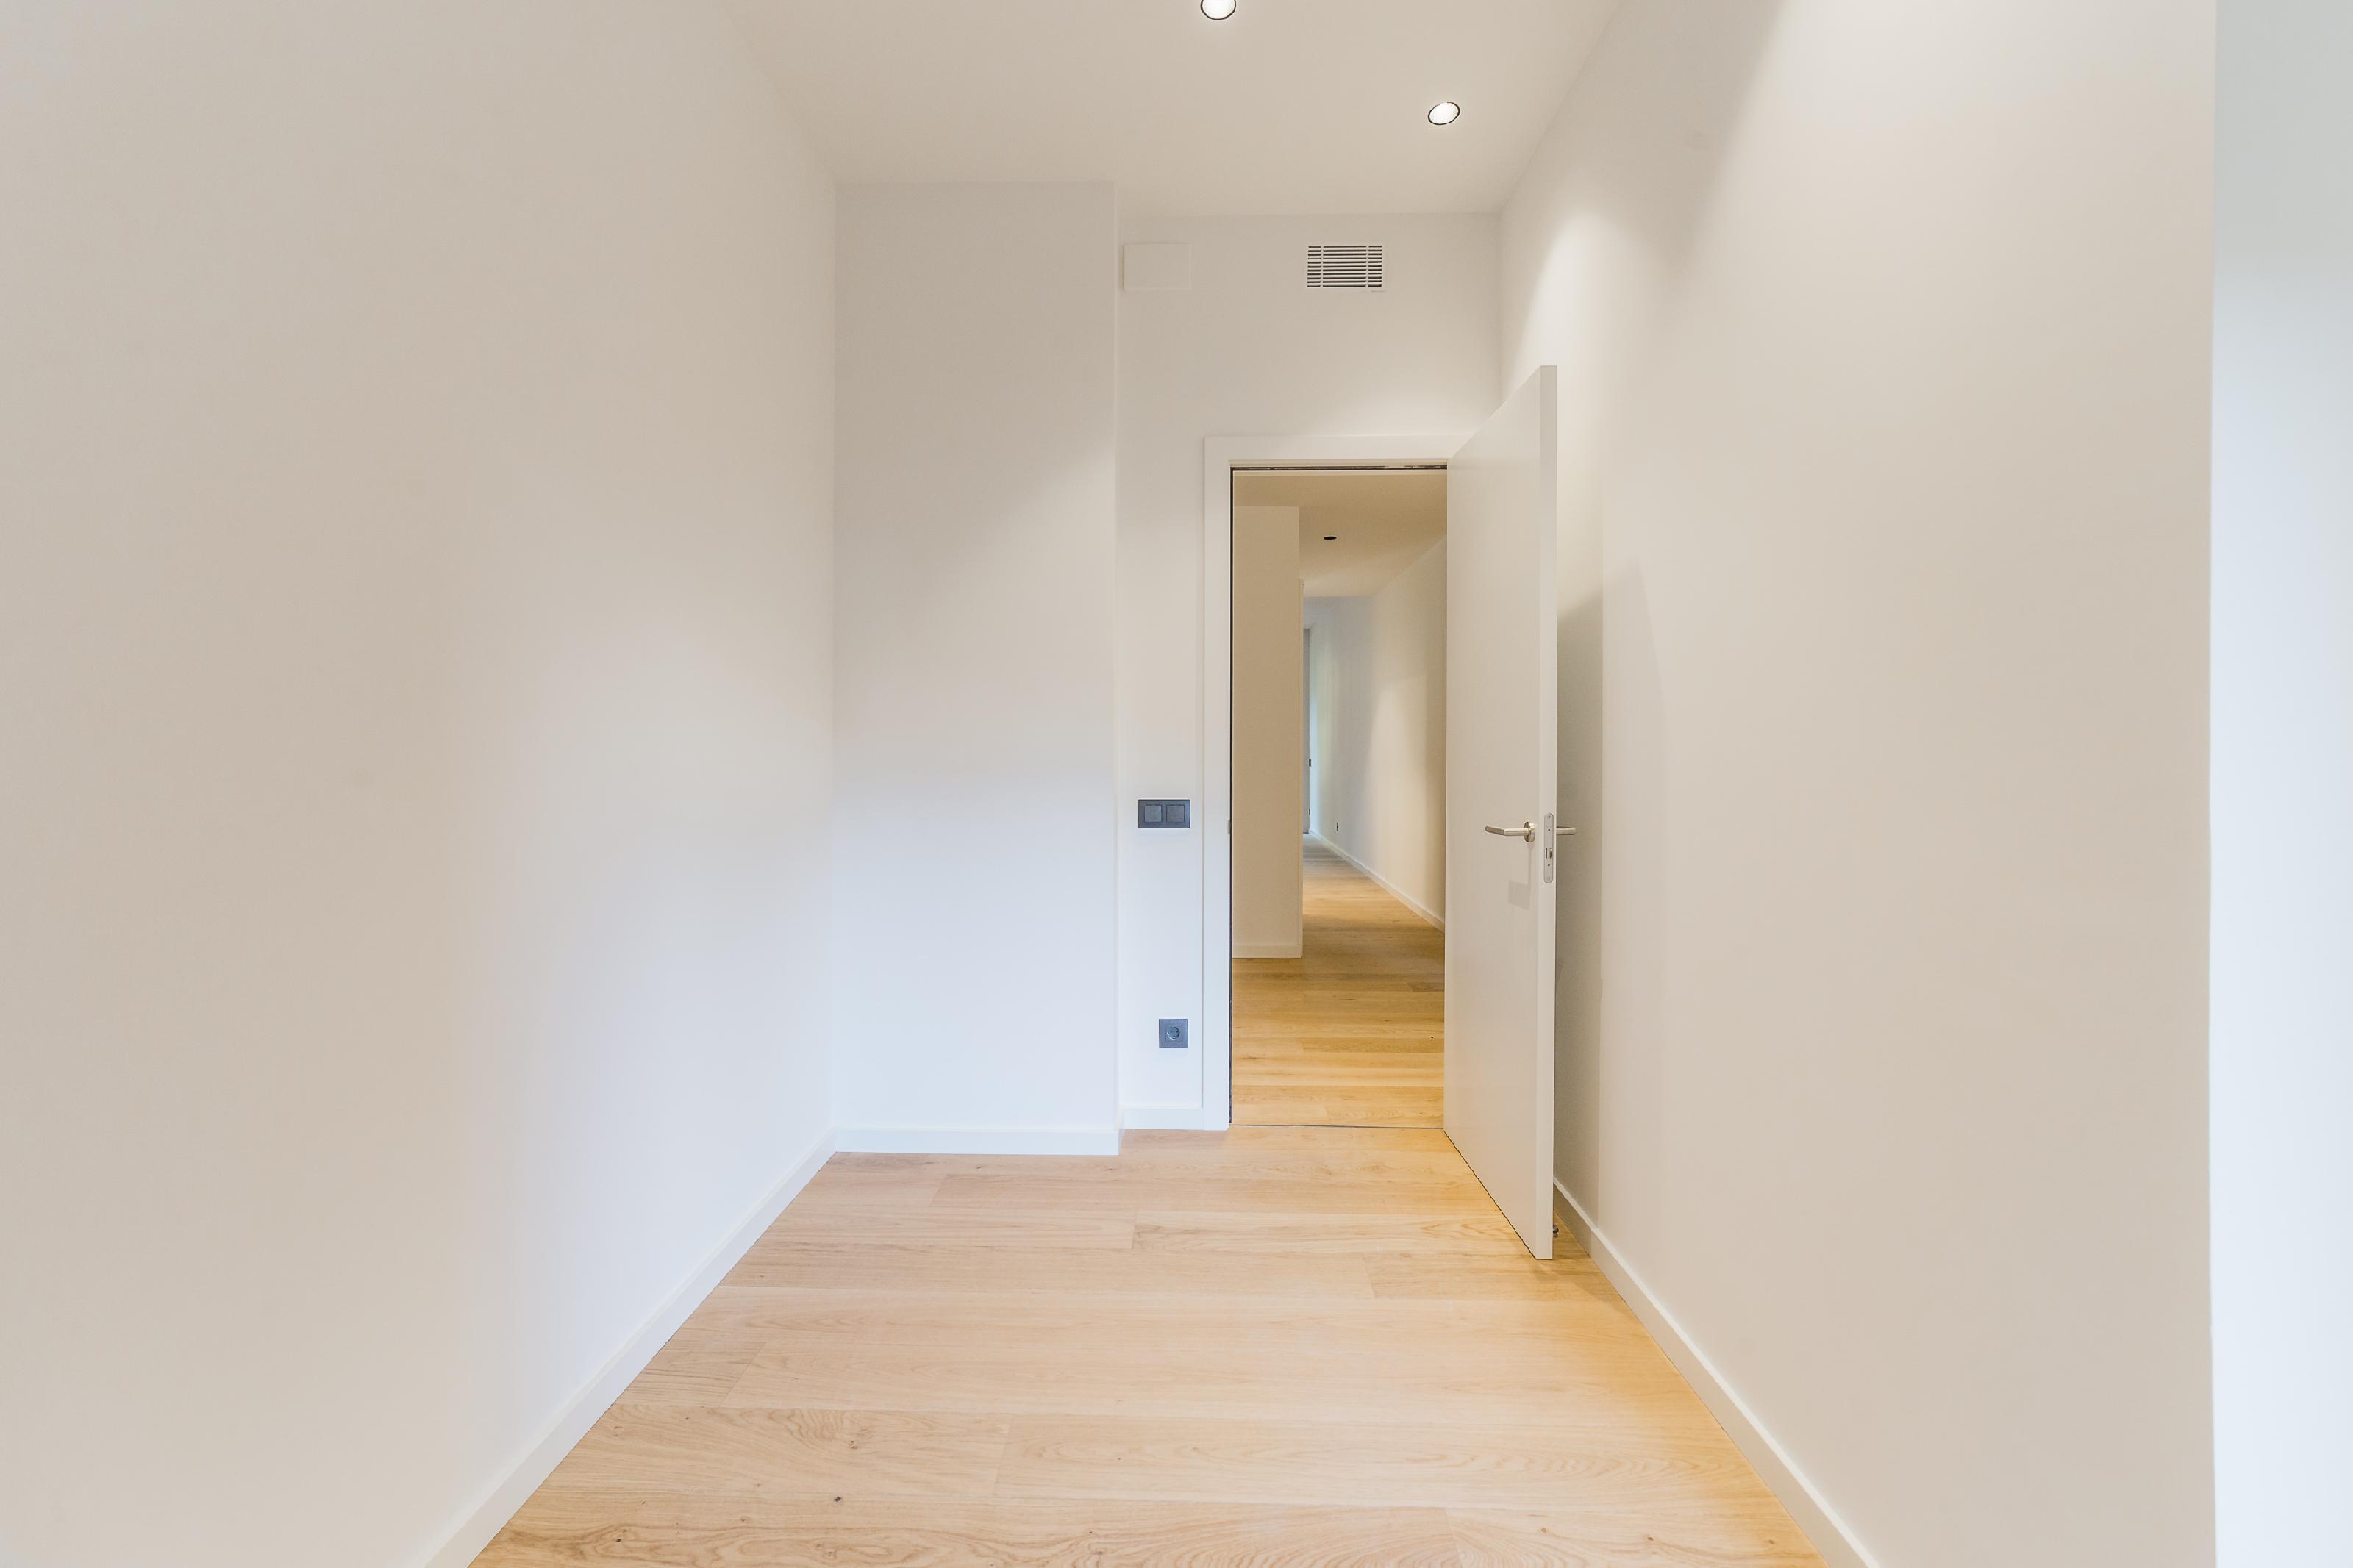 182456 Apartamento en venda en Eixample, Antiga Esquerre Eixample 22